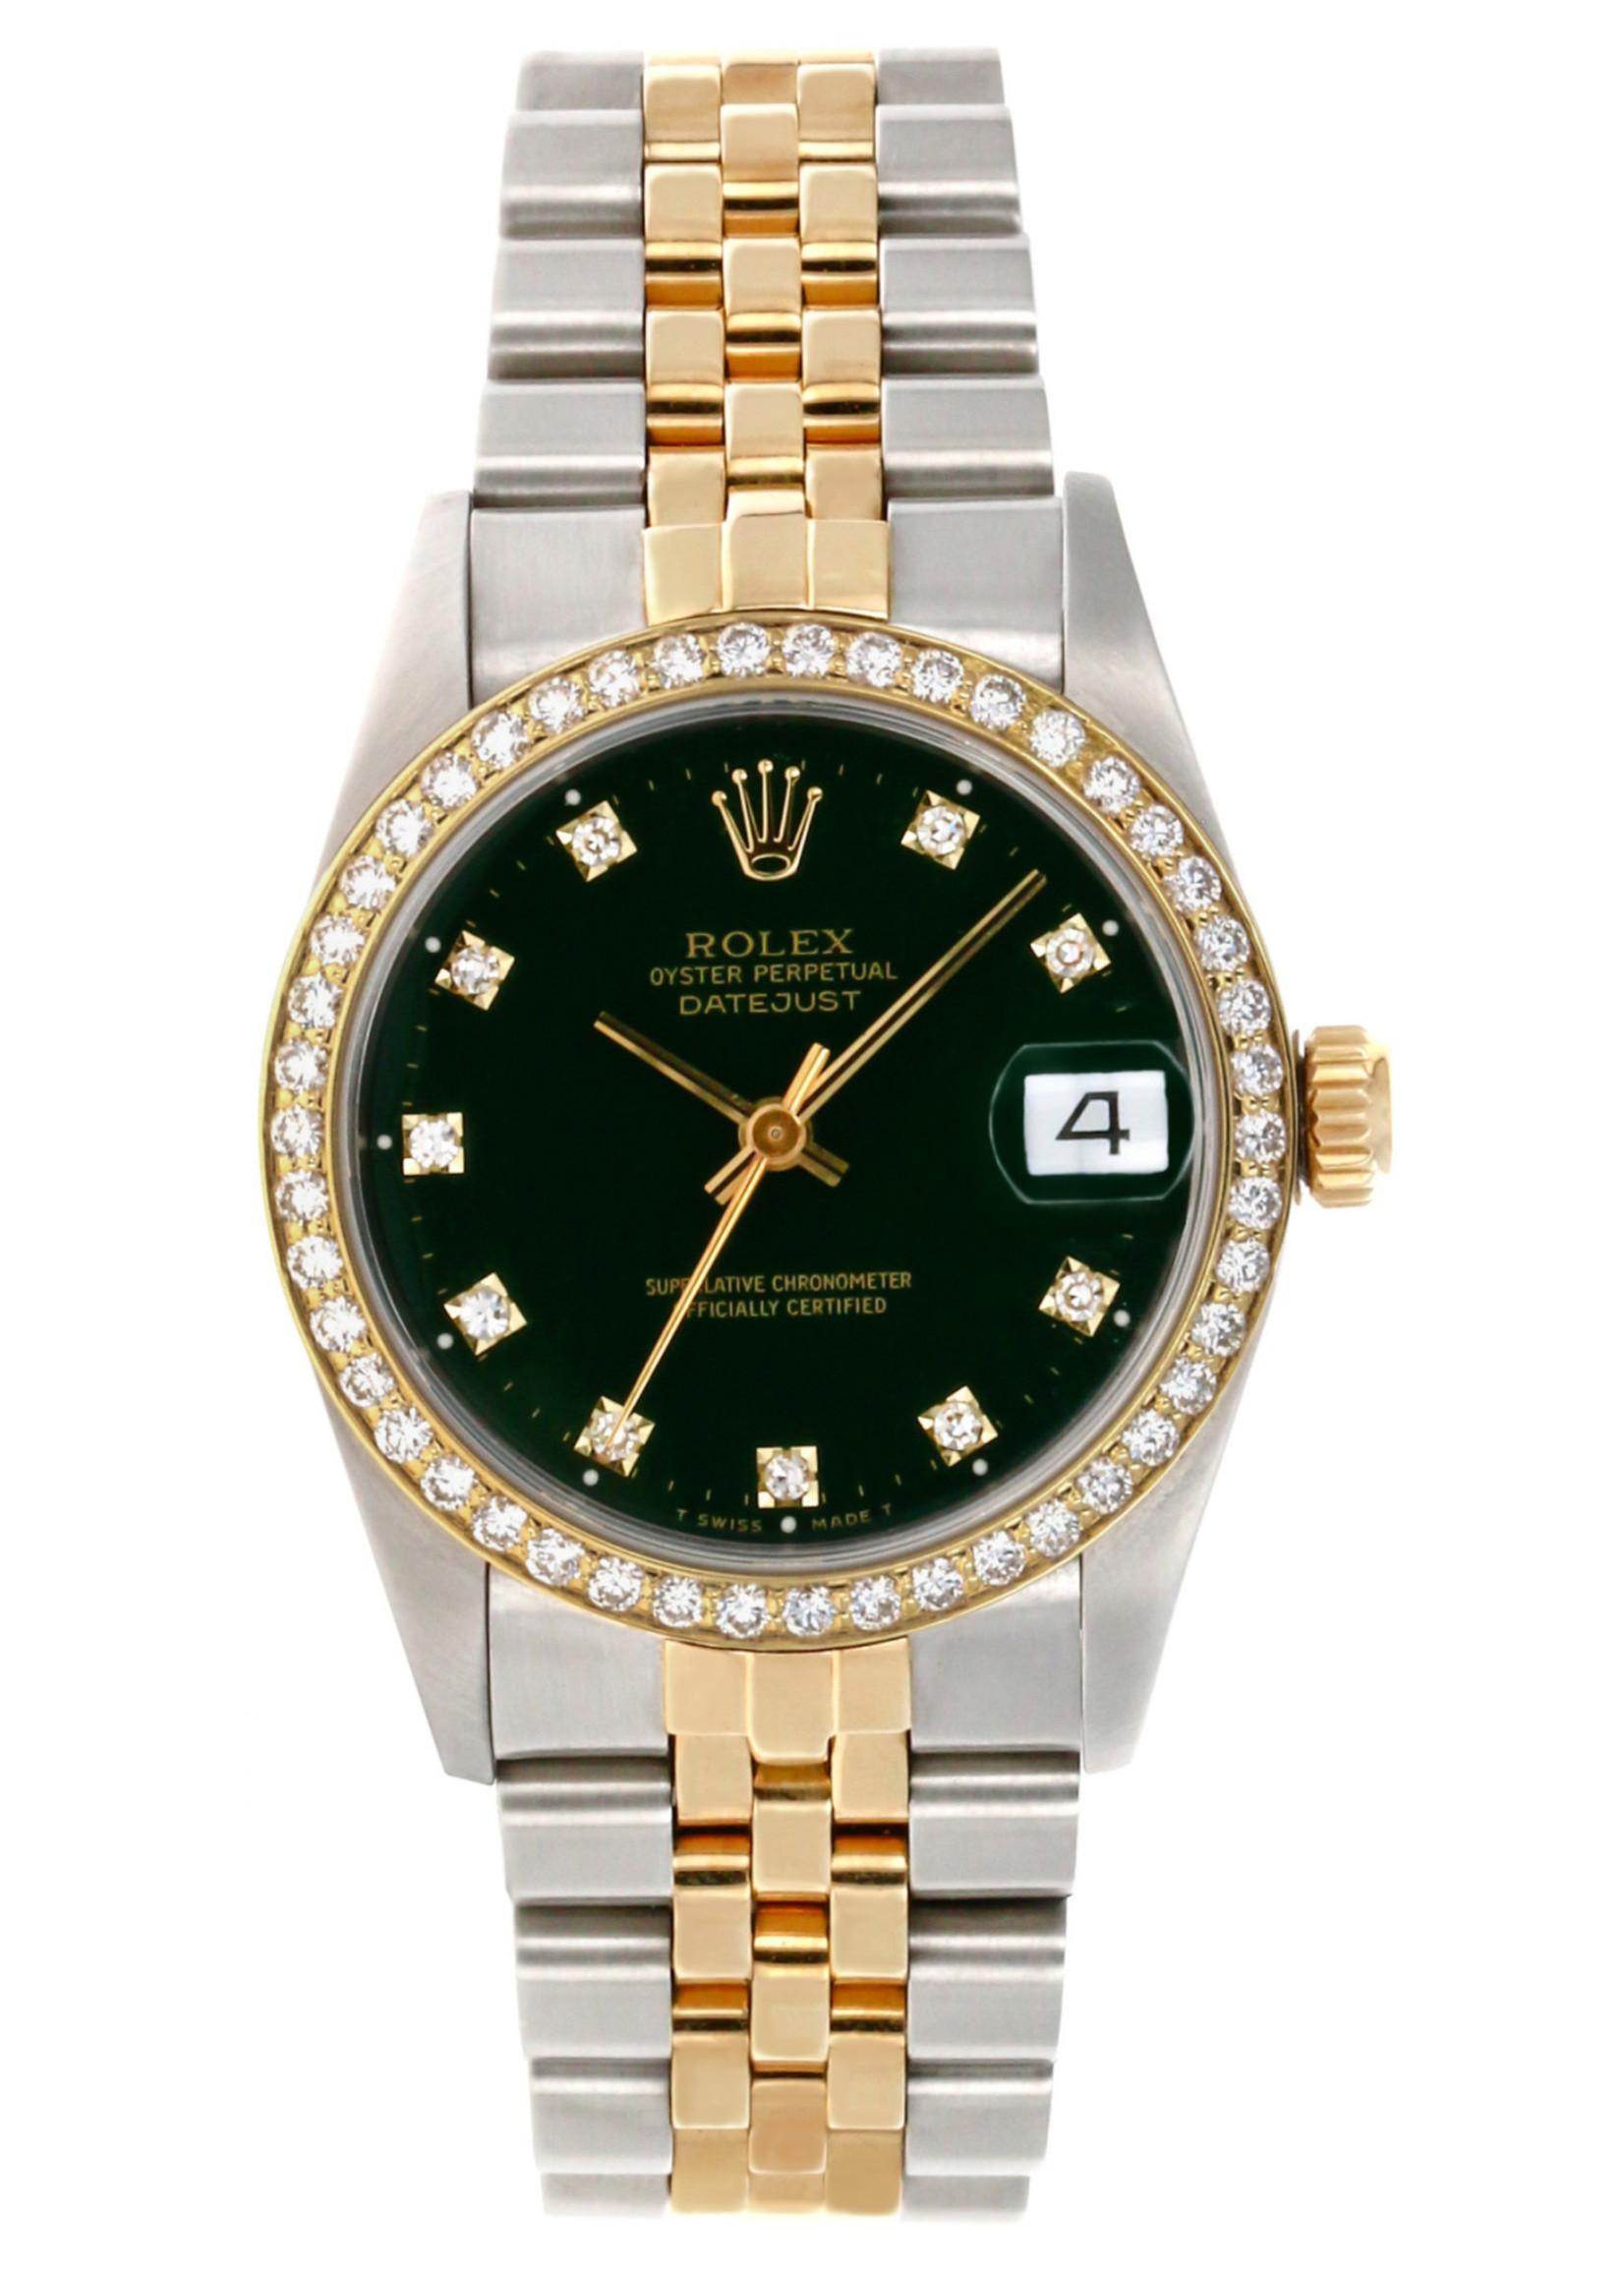 Rolex ROLEX DATEJUST 31MM JUBILEE #278273